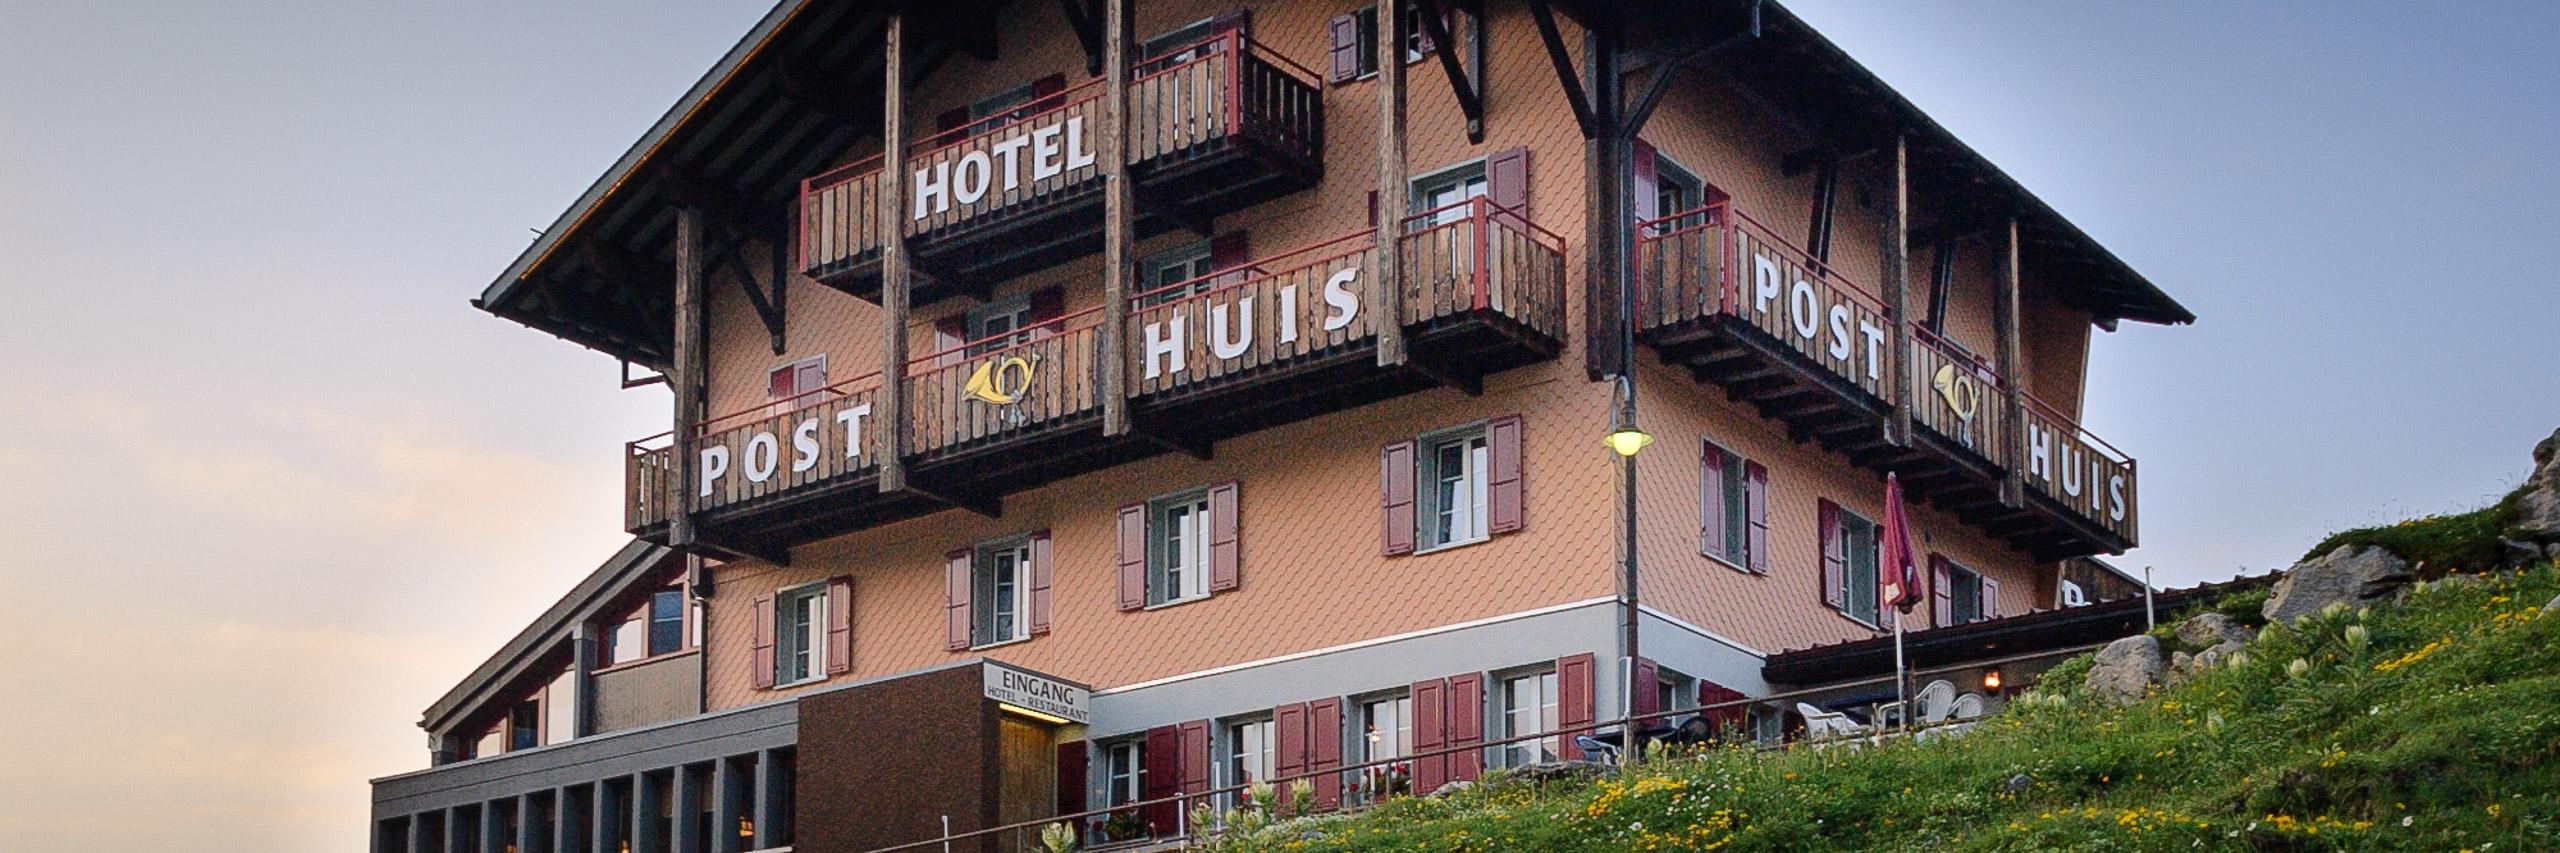 Hotel Posthuis, Melchsee-Frutt